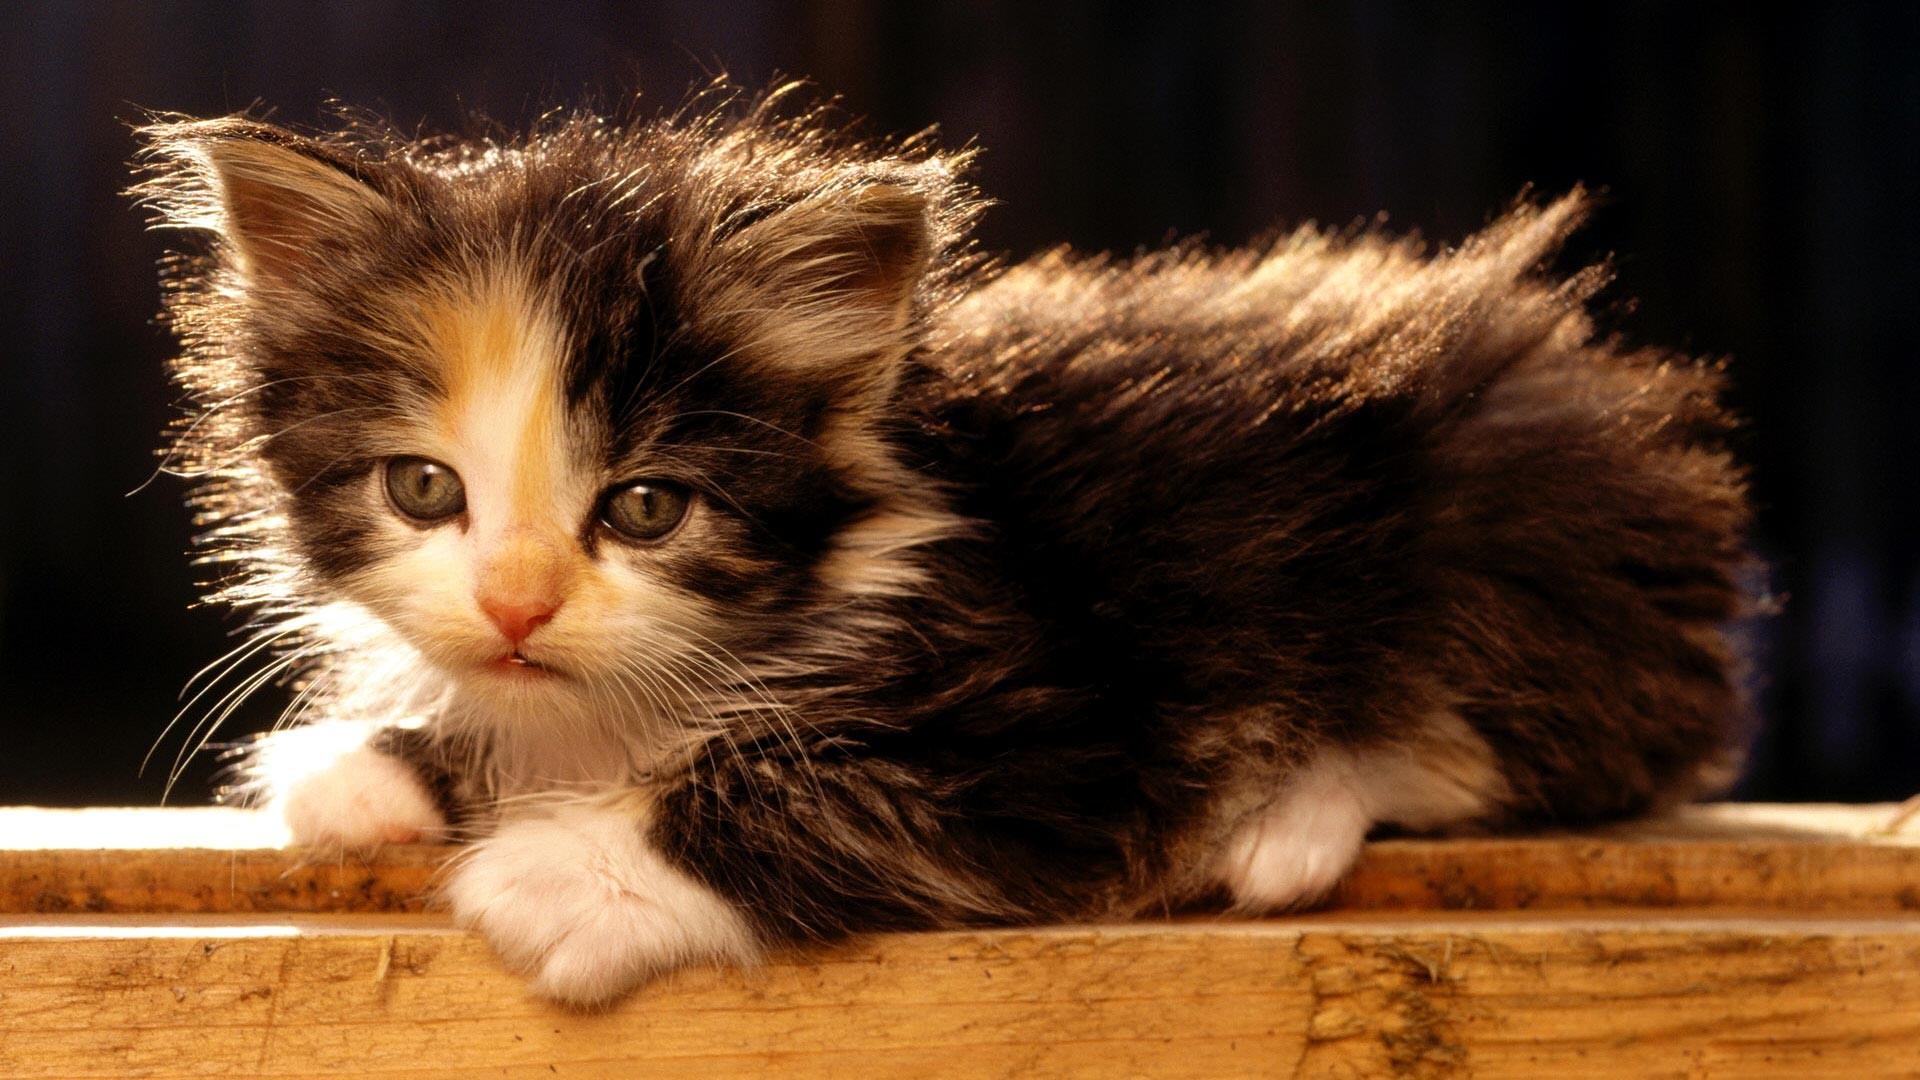 Res: 1920x1080, Little fluffy kitten